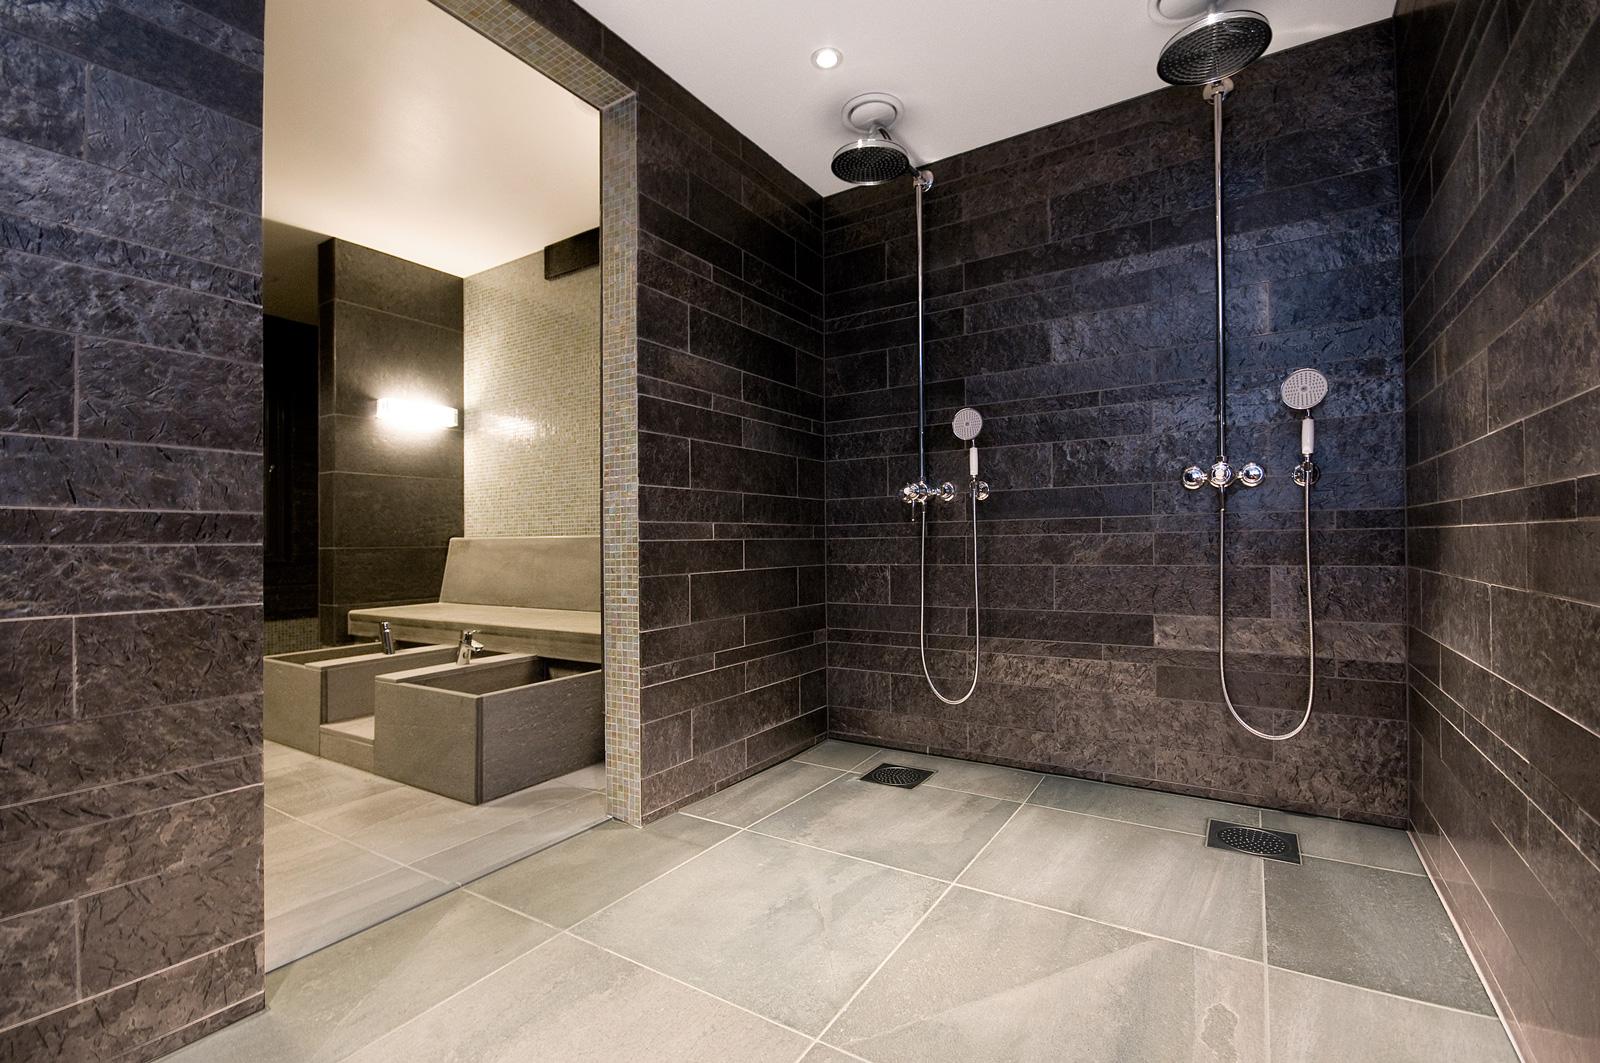 stein p badet m rk eller lys nr14 interi rhjelp. Black Bedroom Furniture Sets. Home Design Ideas